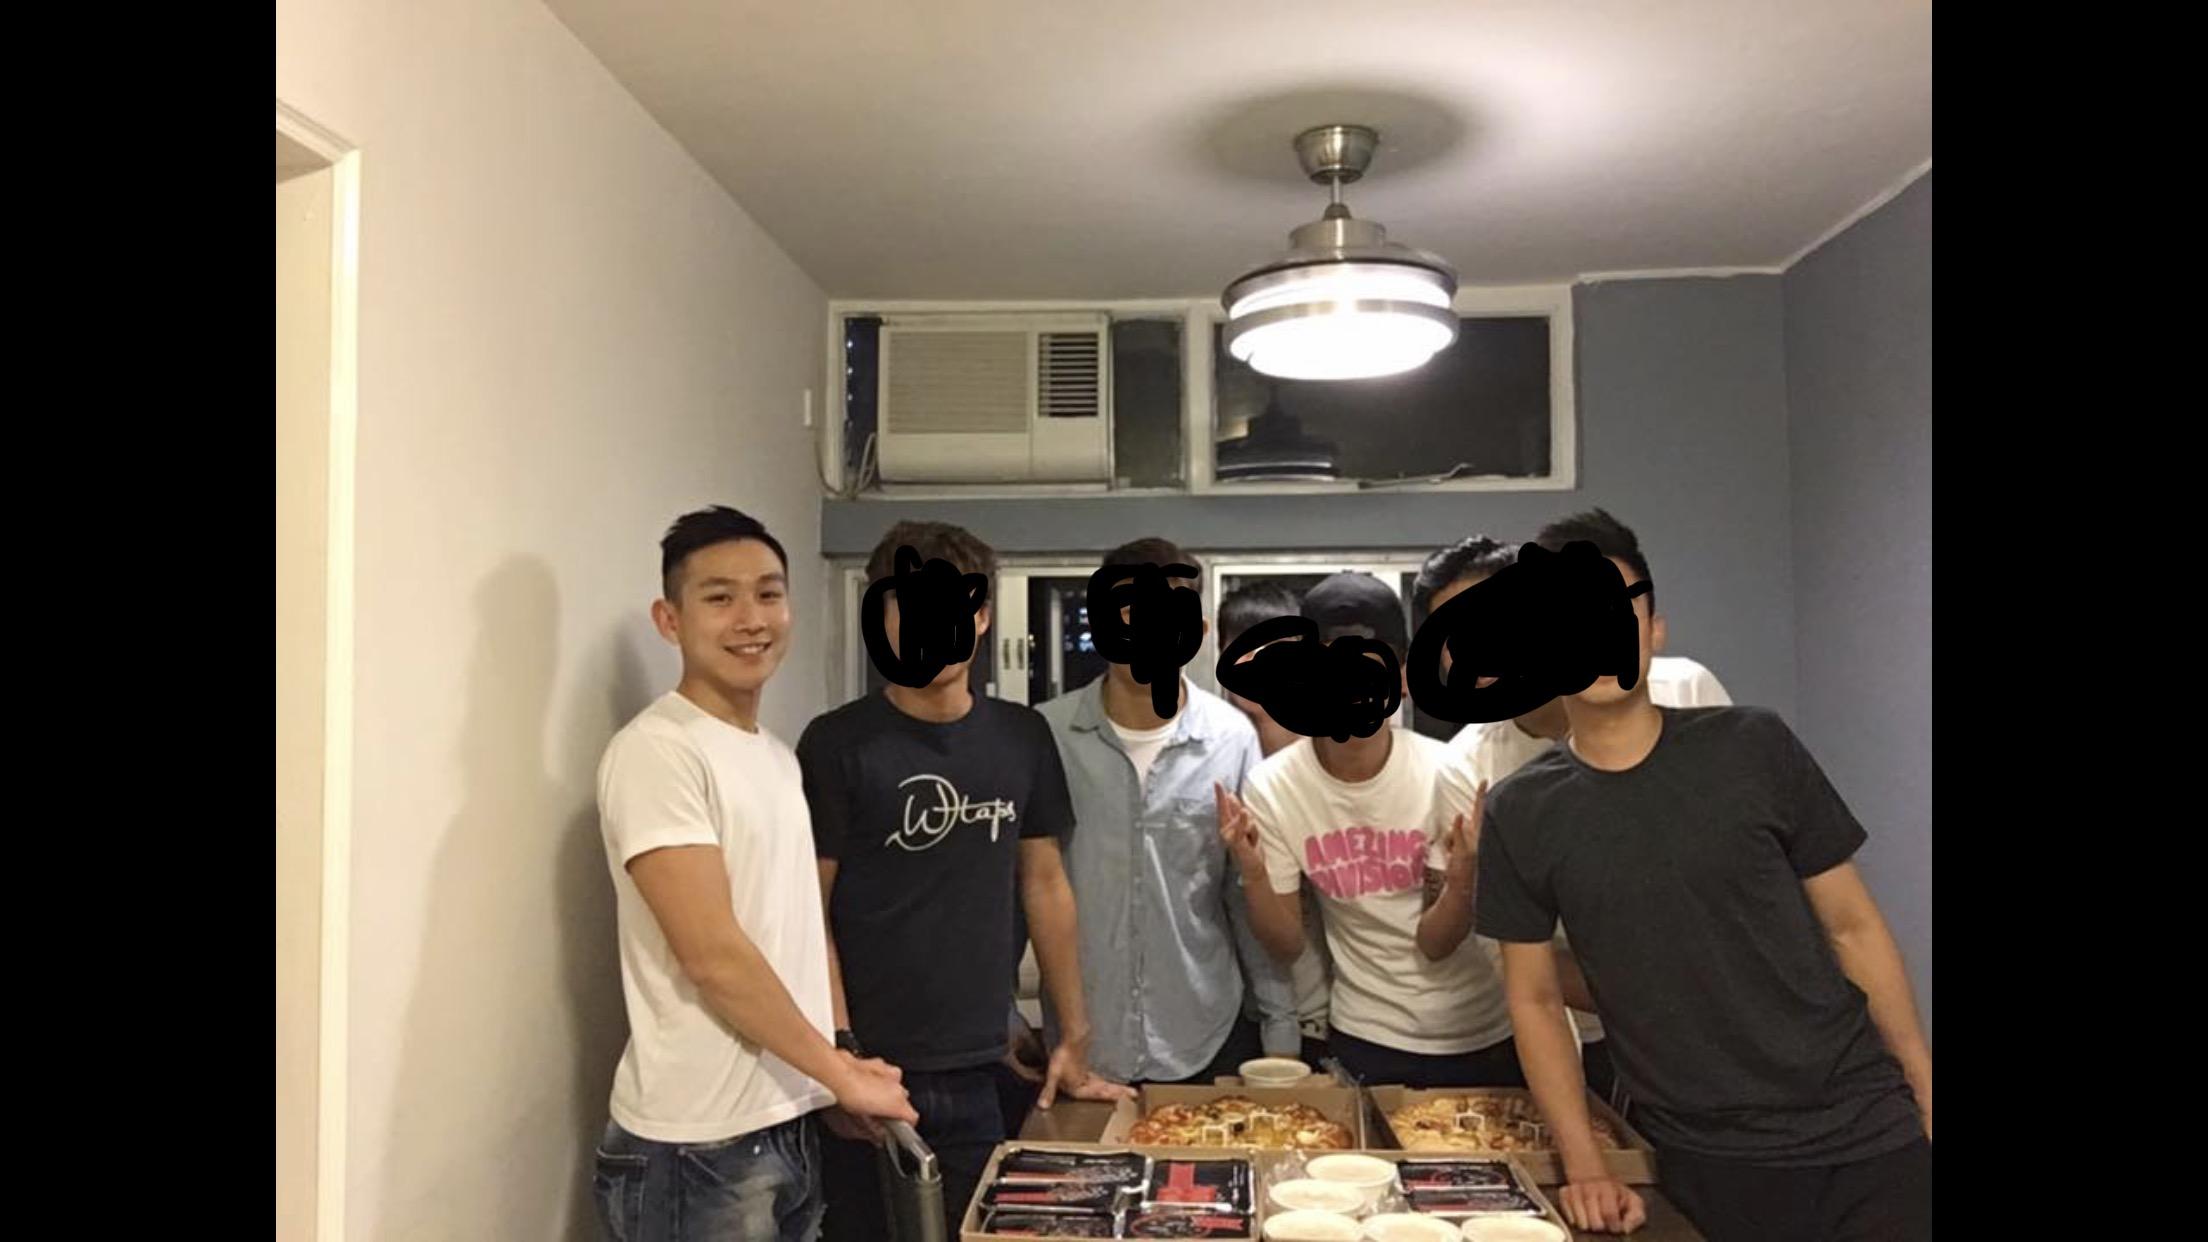 [img]https://upload.cc/i1/2019/06/13/yZpqHo.jpg[/img]